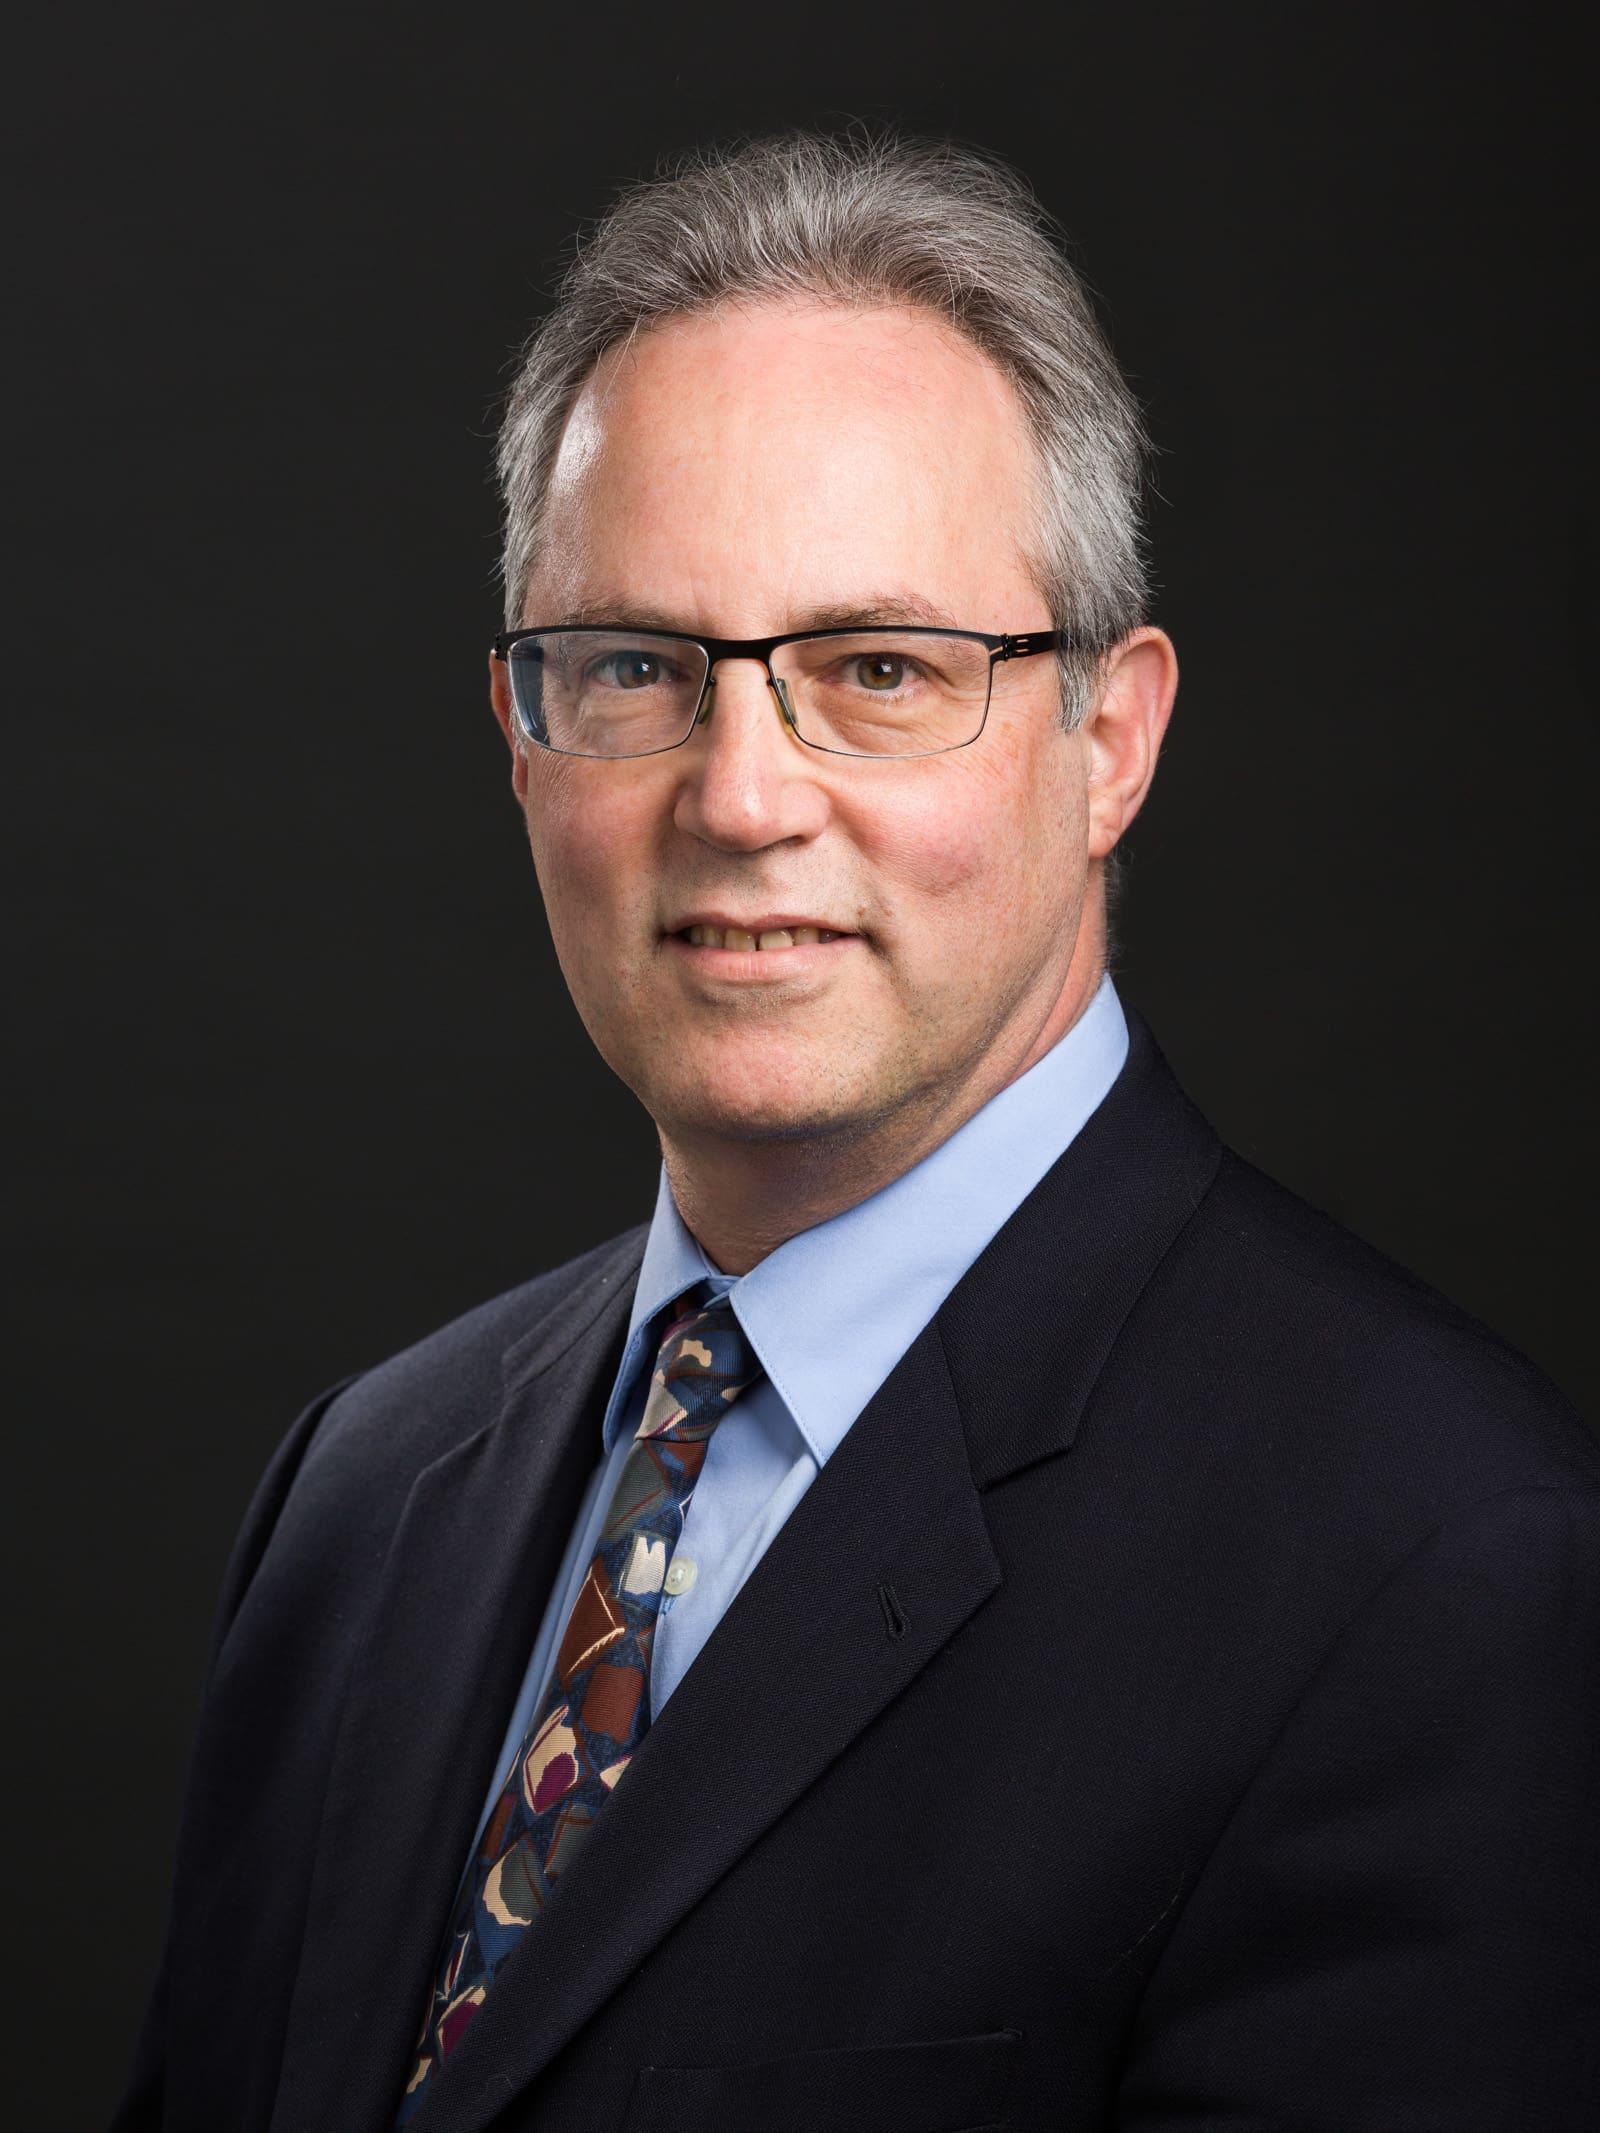 Michael Schilsky